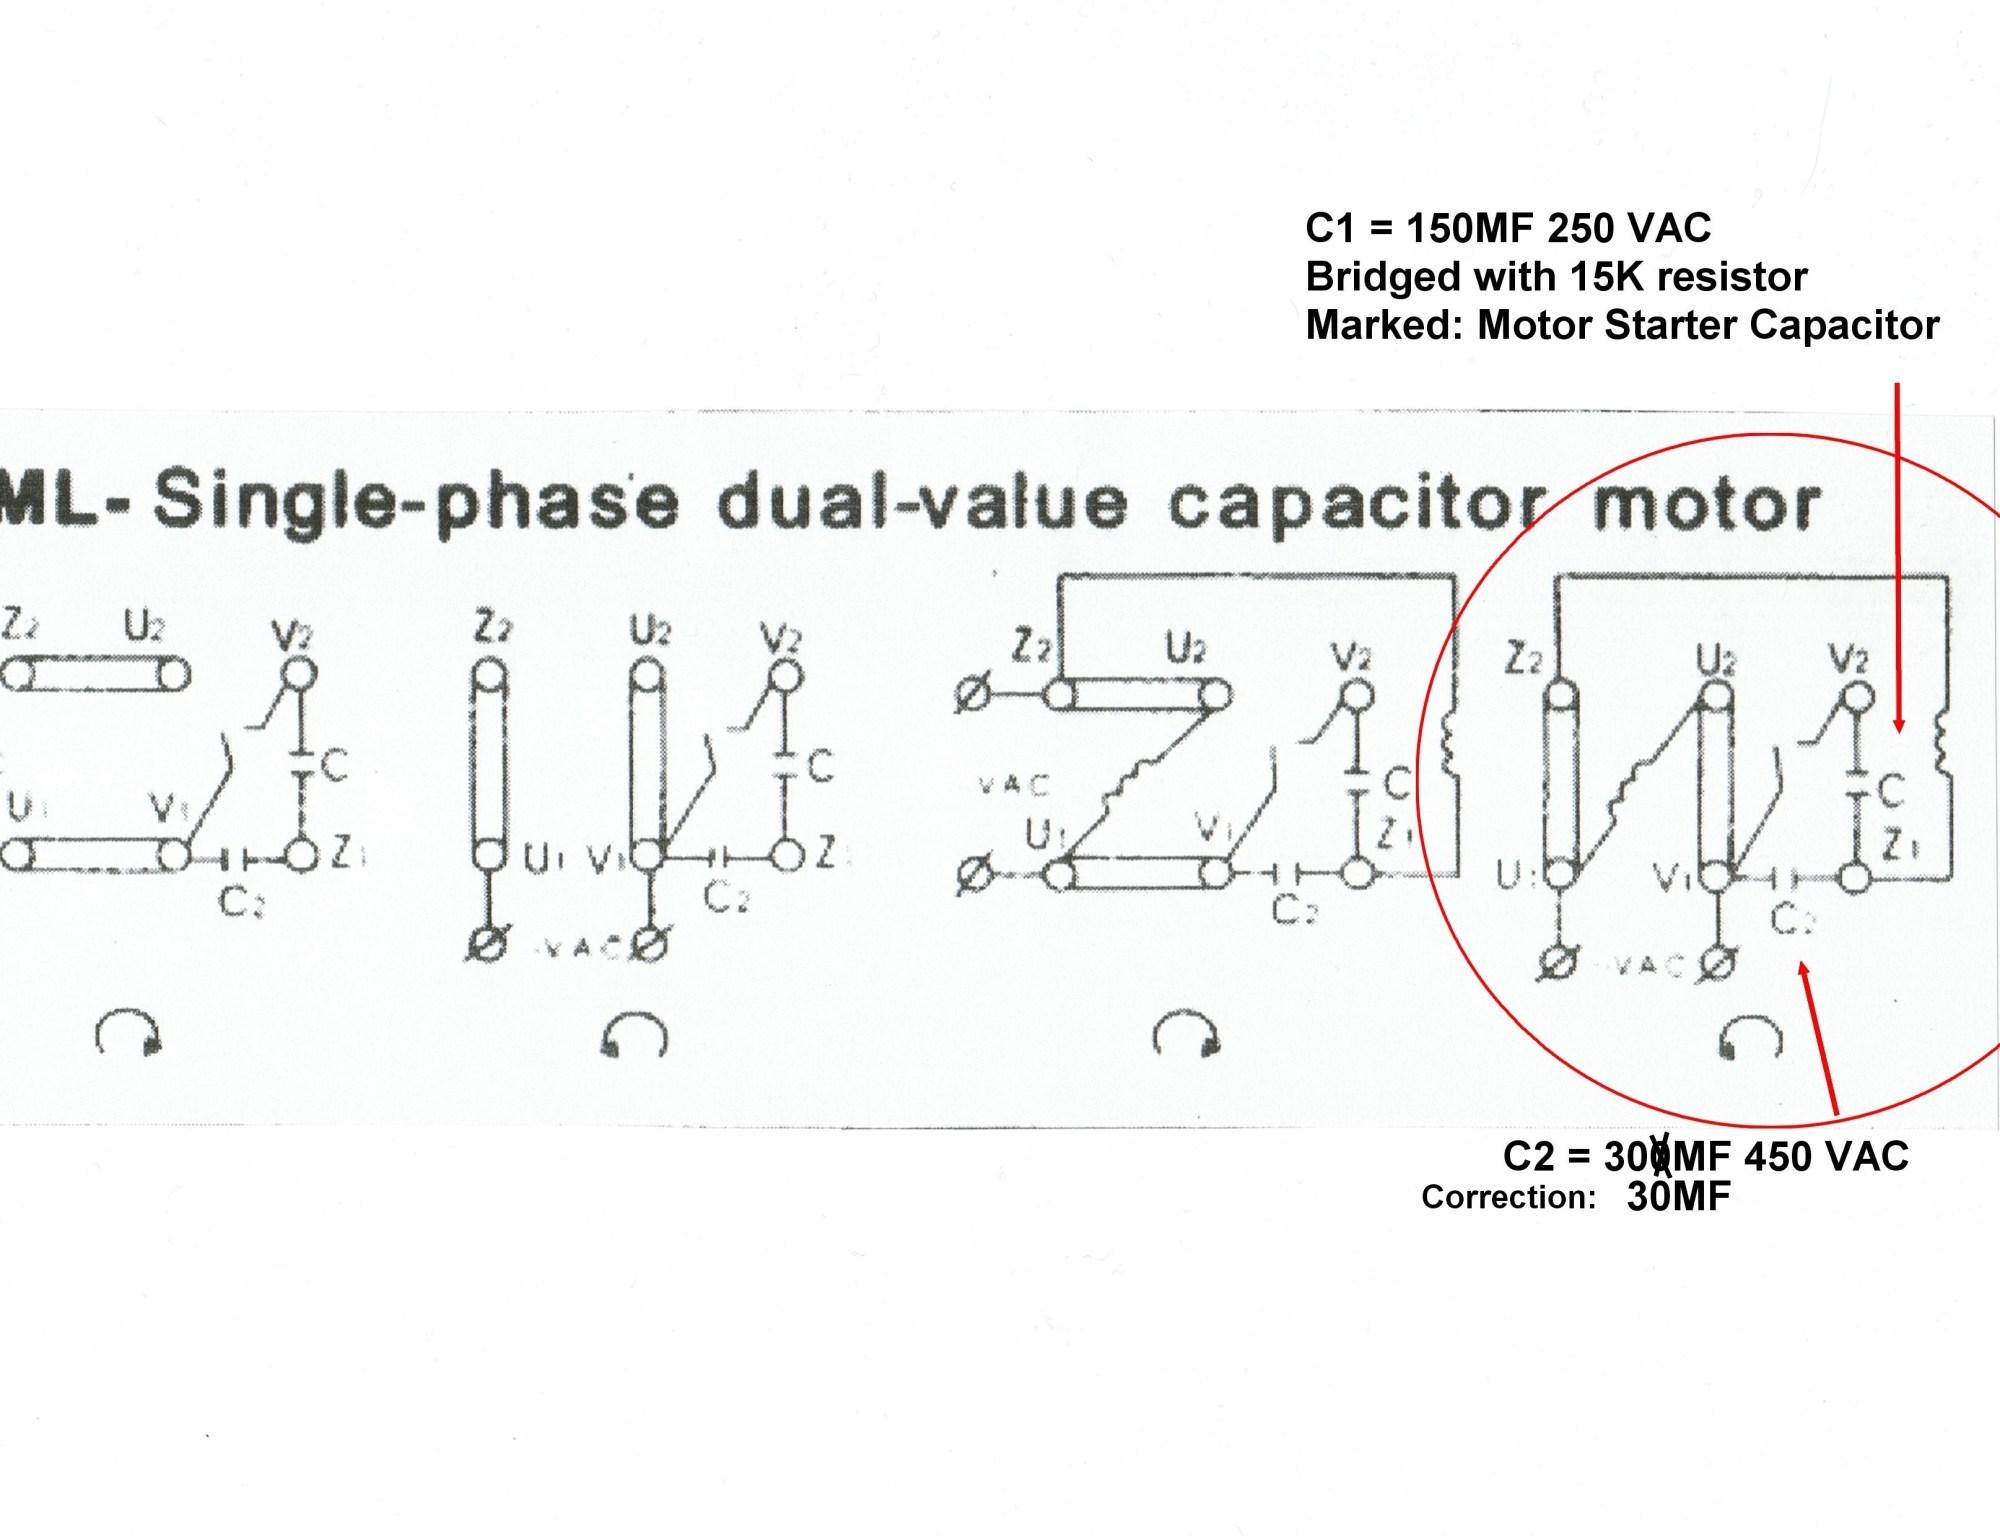 hight resolution of 6 lead motor wiring diagram wiring diagram forward sew 6 lead motor wiring diagram 11 lead